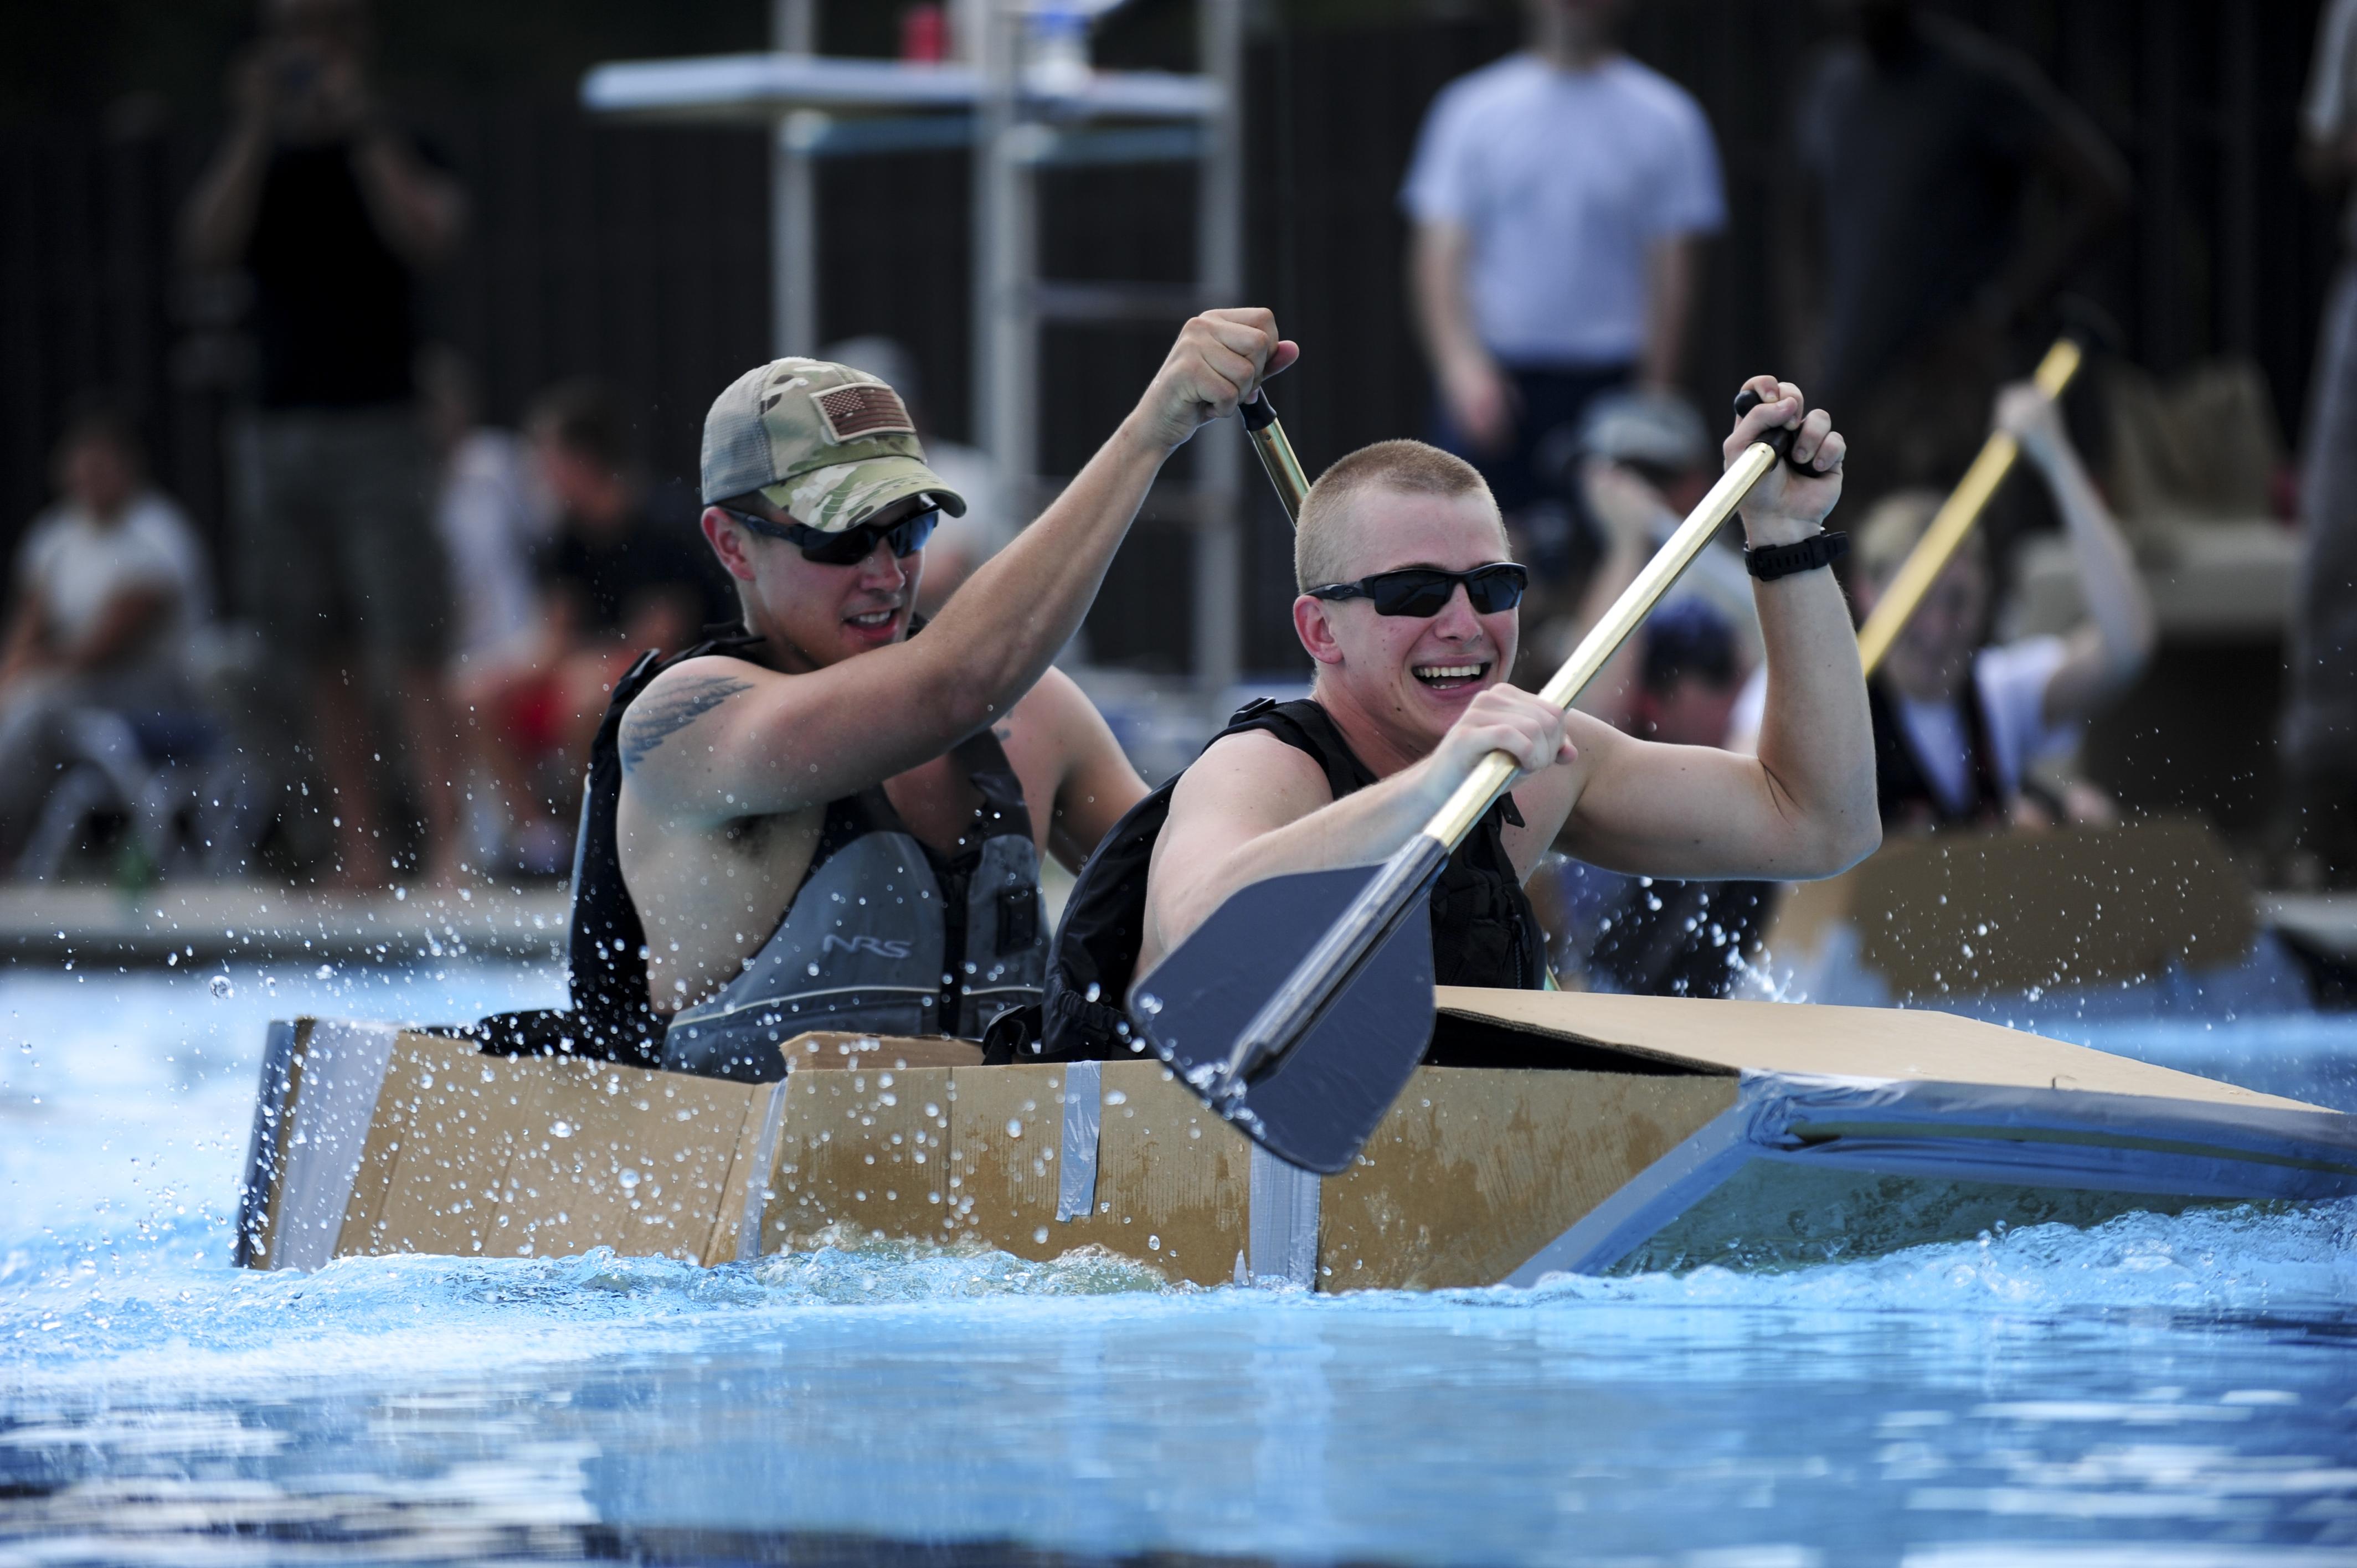 Build a boat - Seymour johnson afb swimming pool ...